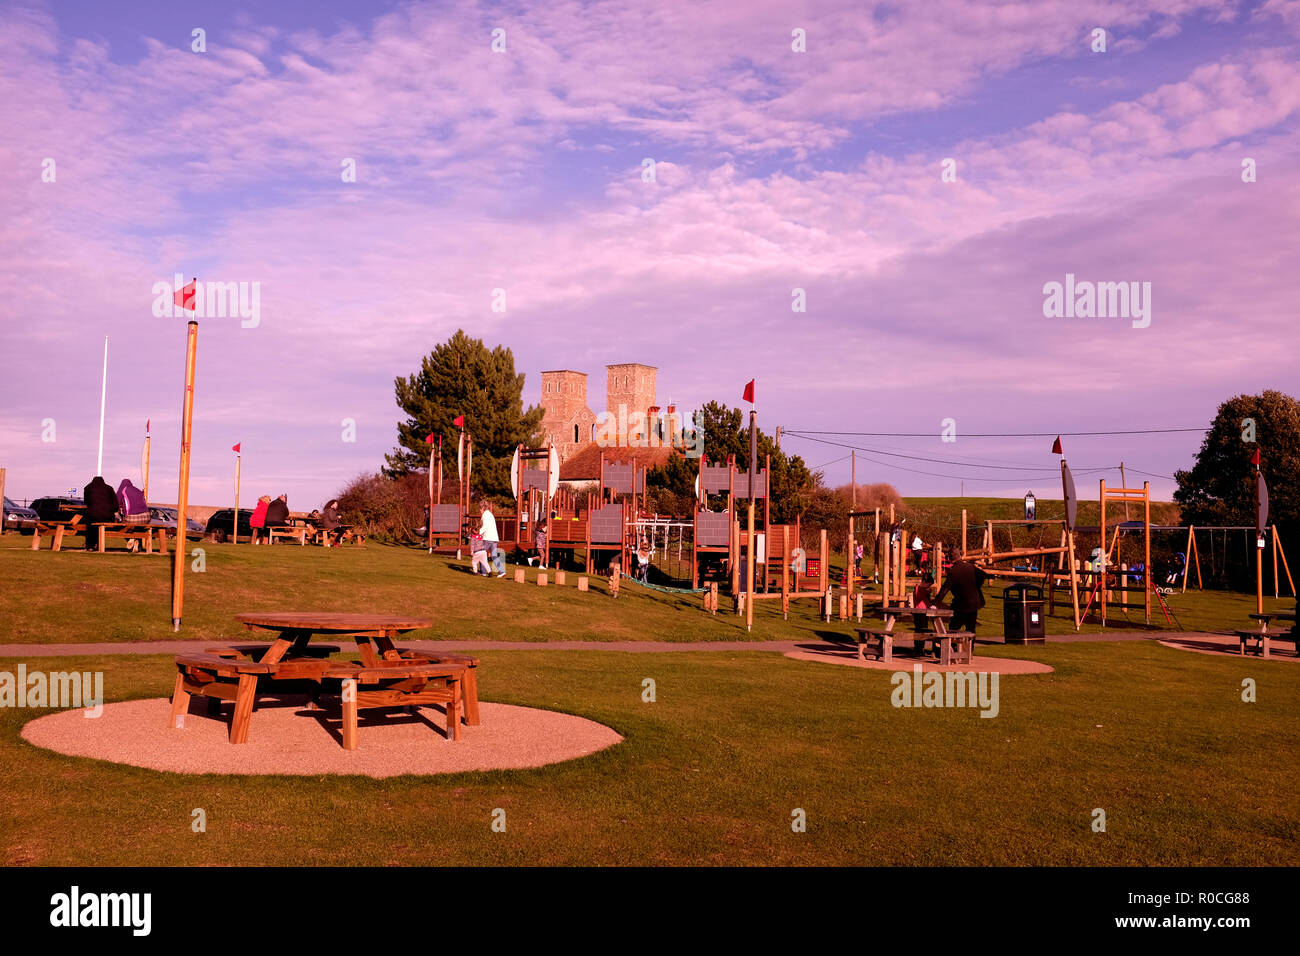 reculver bay in east kent uk nov 2018 - Stock Image